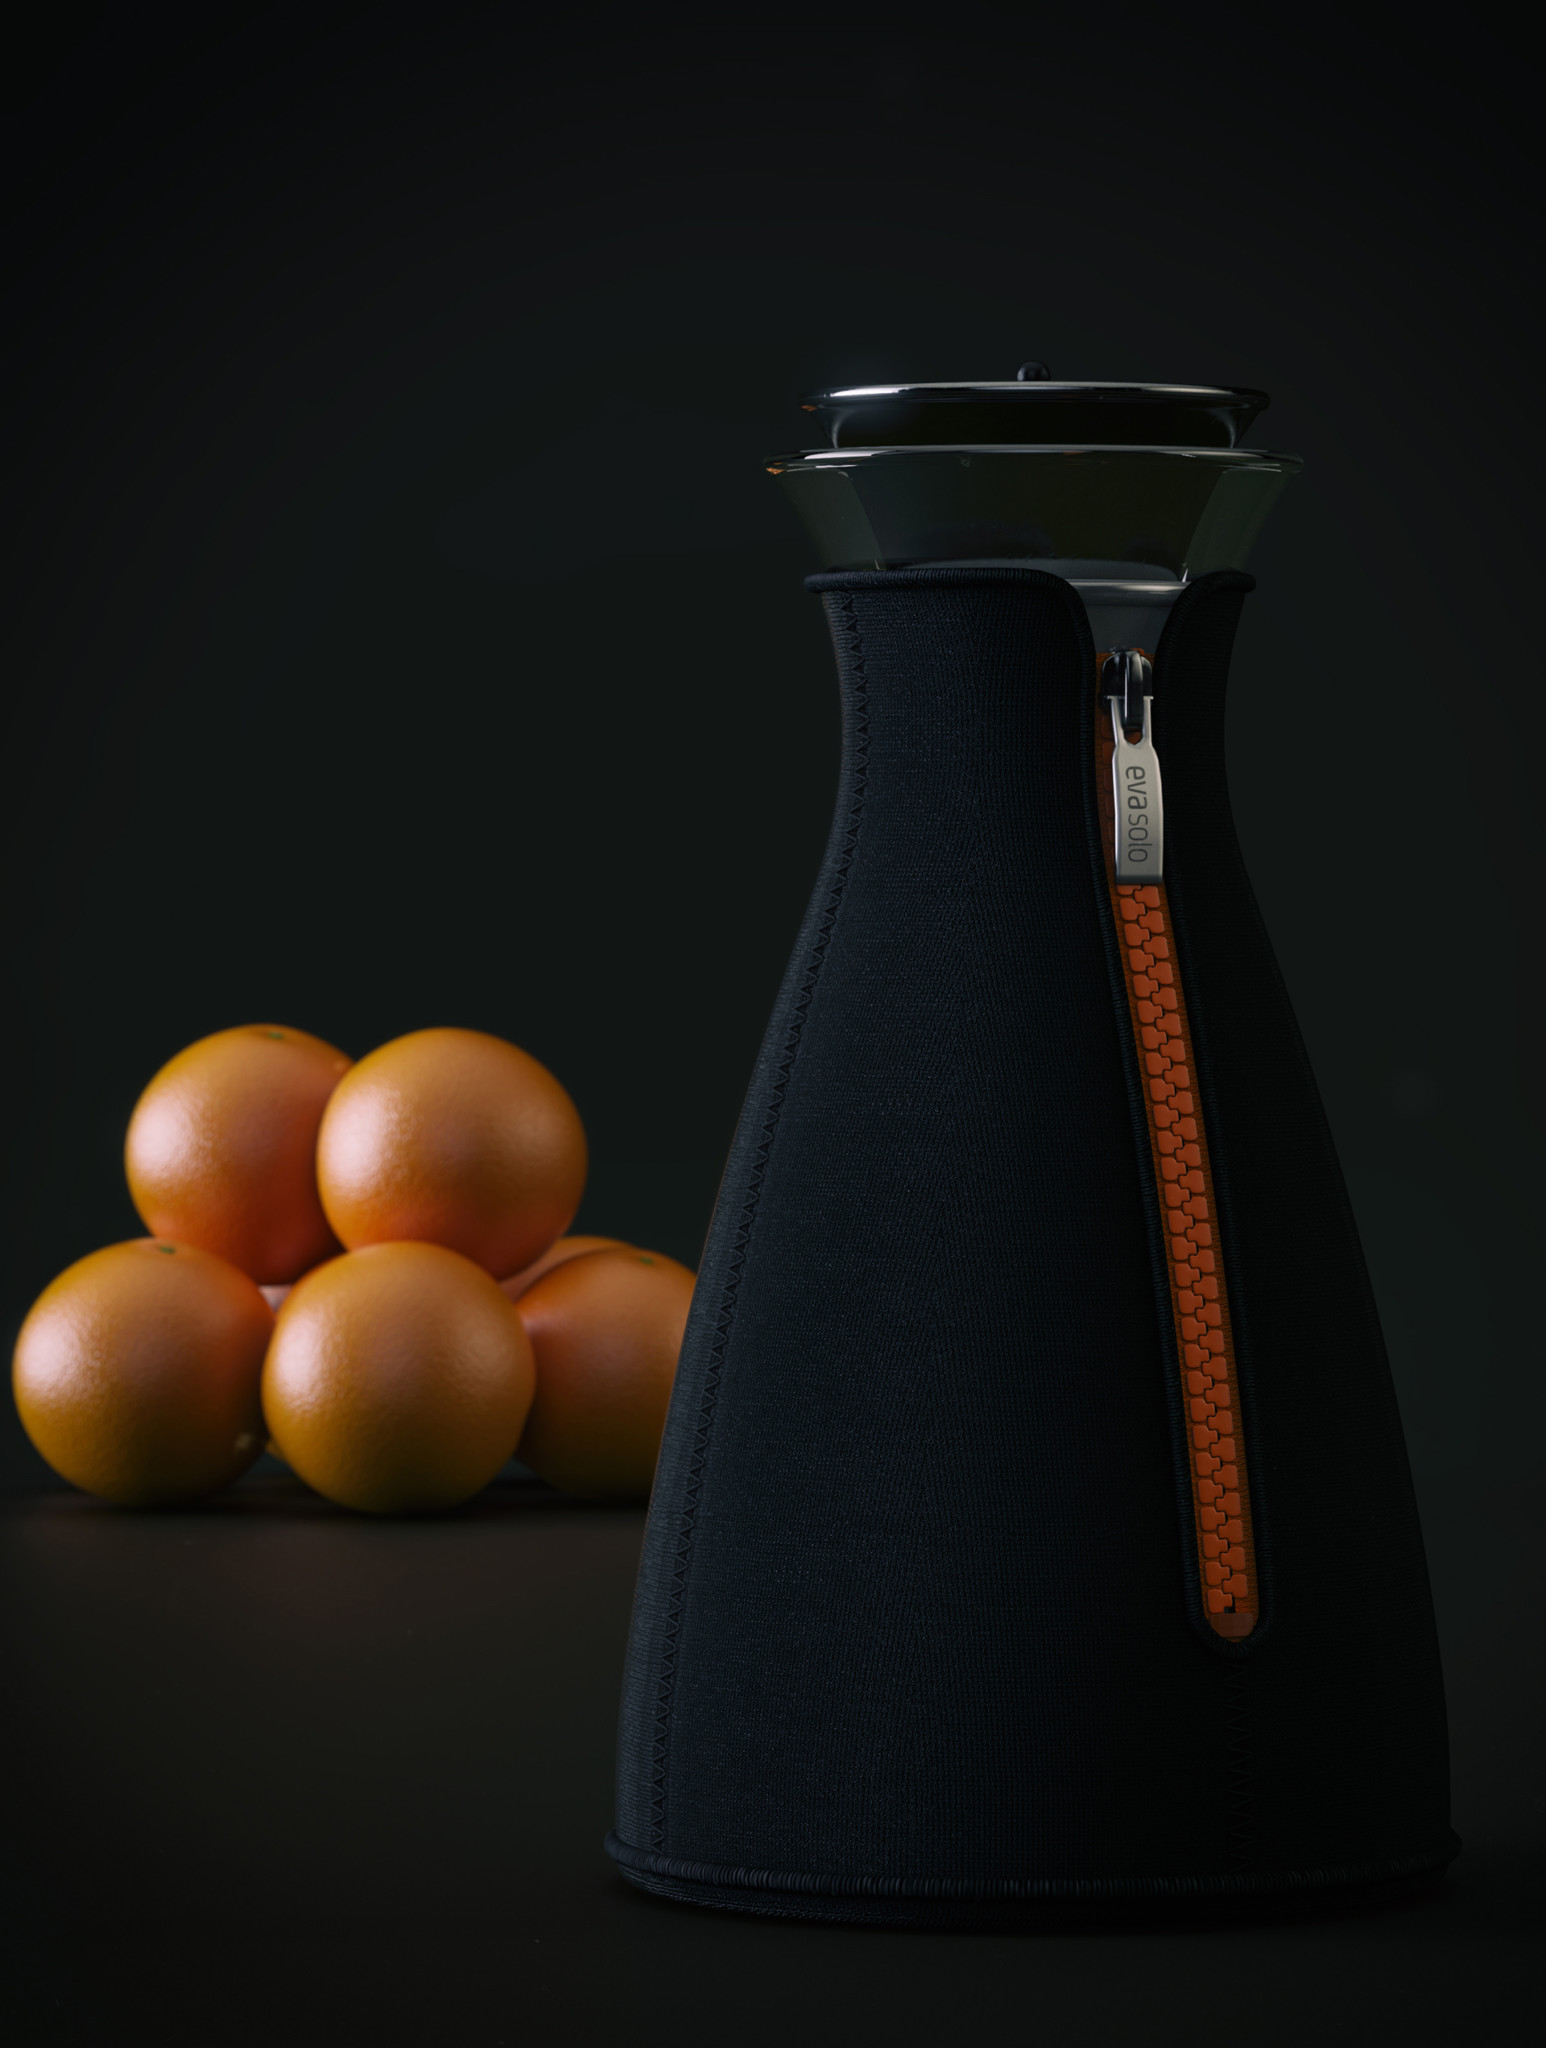 3D Coffee Shot Bottle Illustration